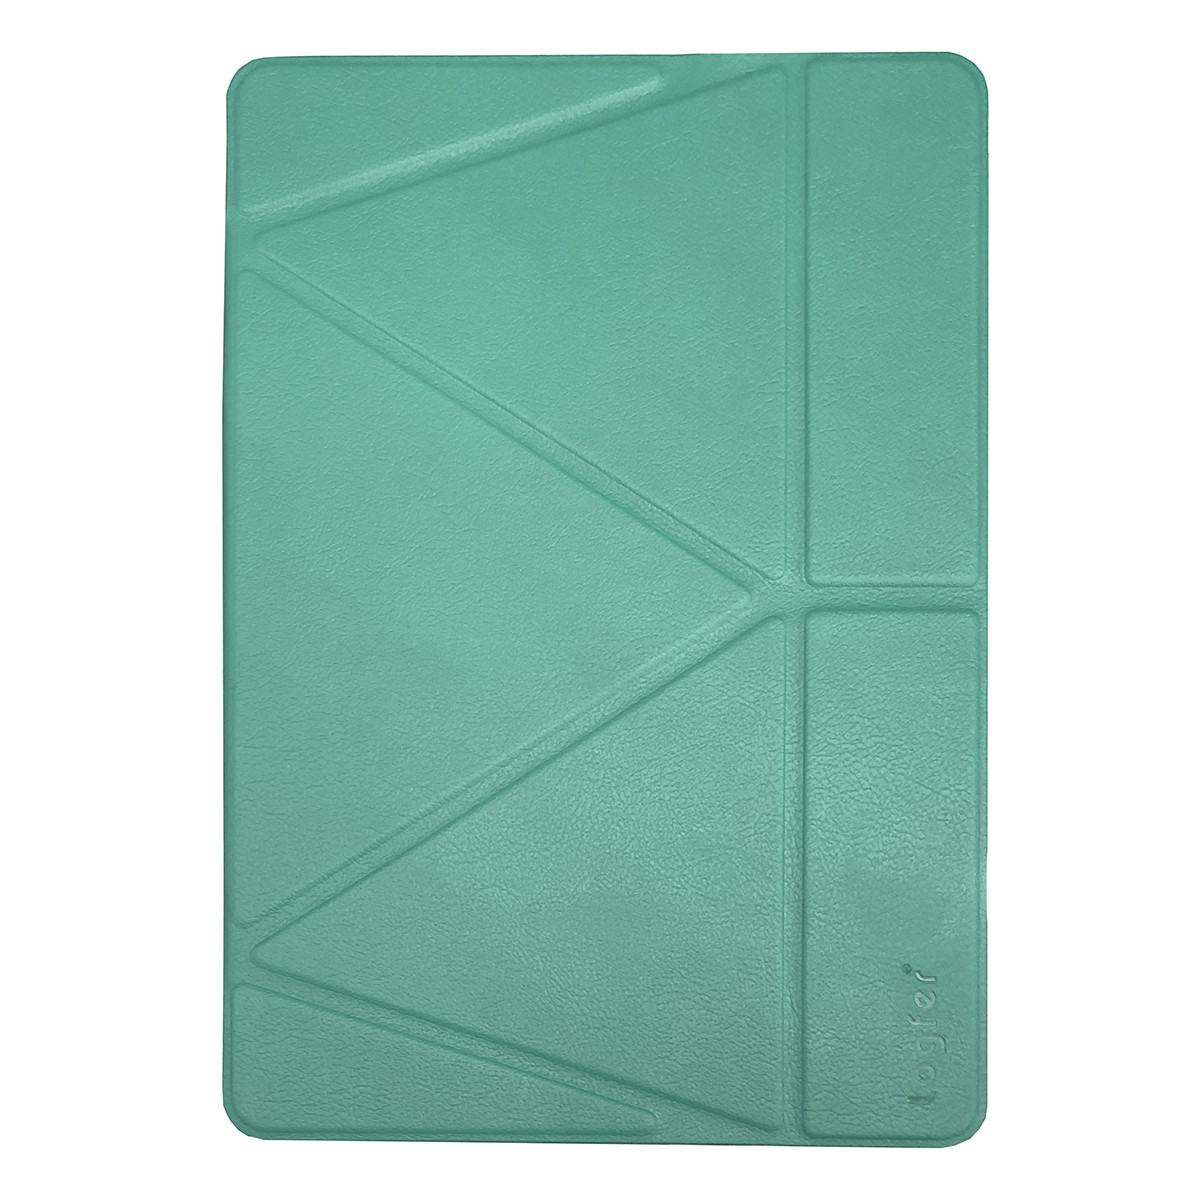 "Чохол Origami Case для iPad Pro 10,5"" / Air 2019 Leather green"